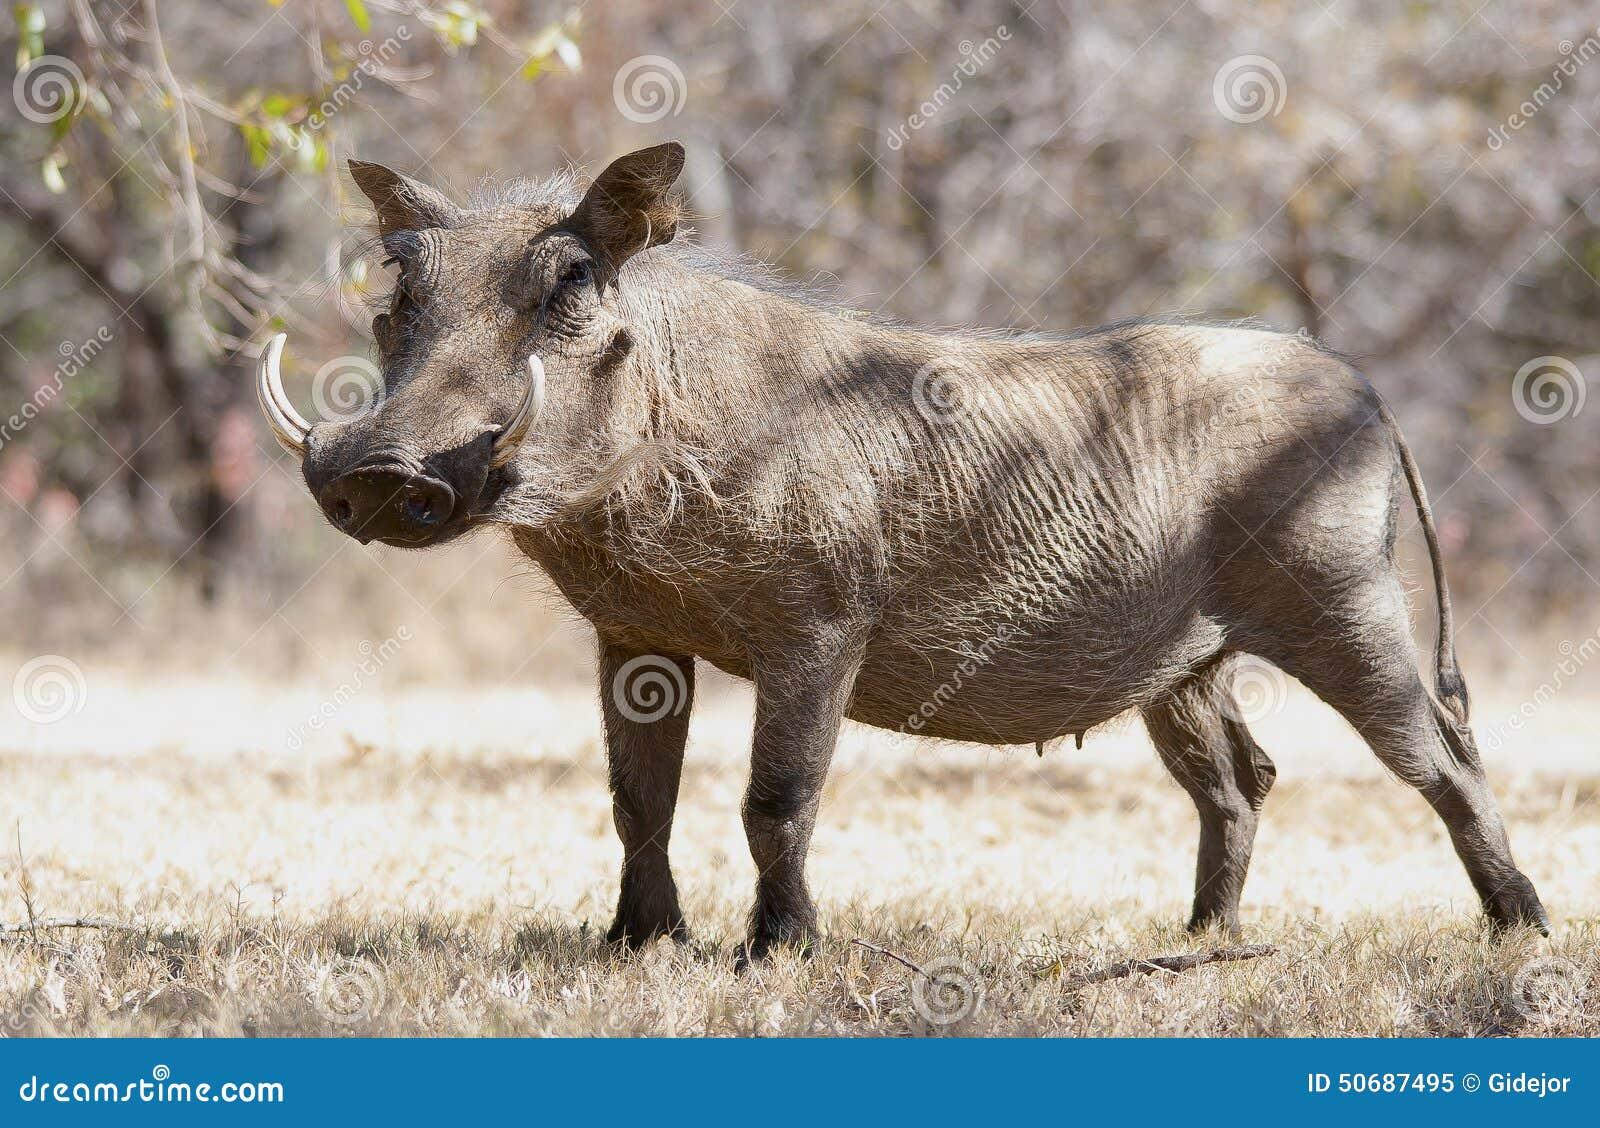 Download 在干草的Warthog在克鲁格公园 库存图片. 图片 包括有 kruger, 南部, 配置文件, 无格式 - 50687495